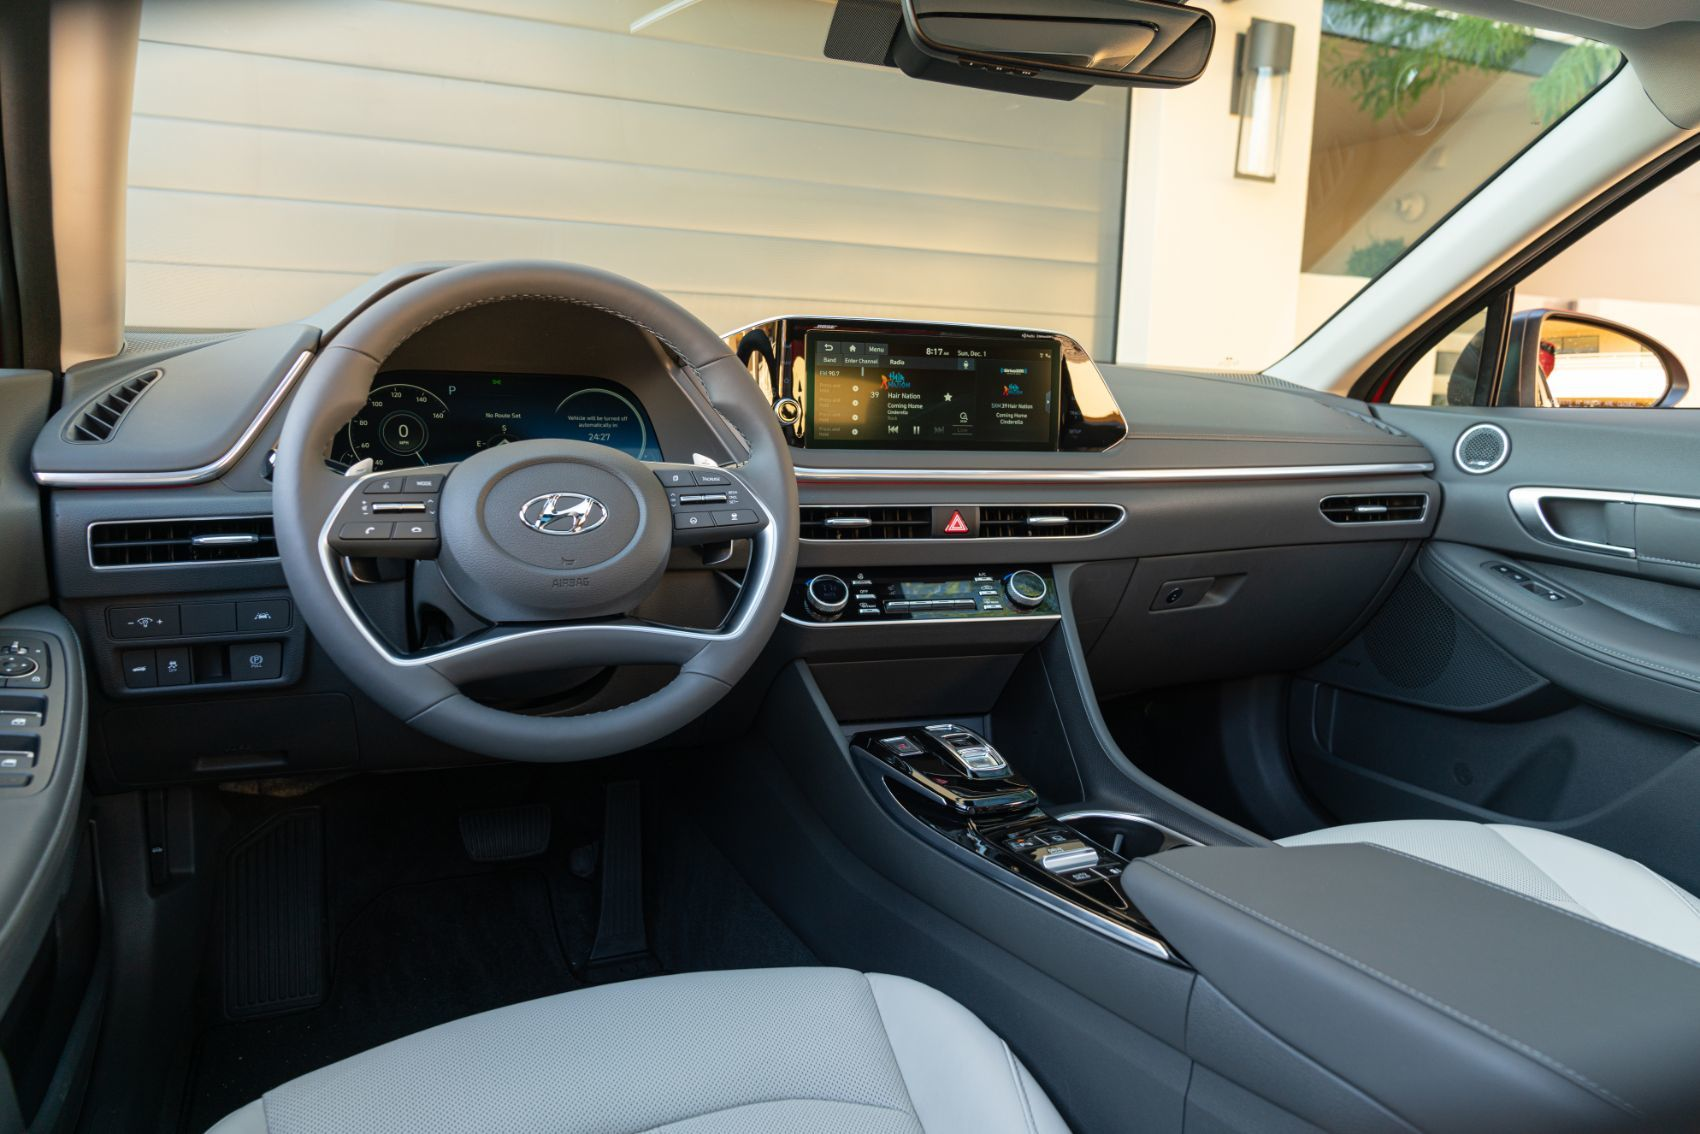 2020 Hyundai Sonata Limited Review: Near Perfect Sedan For Everyday Life 15